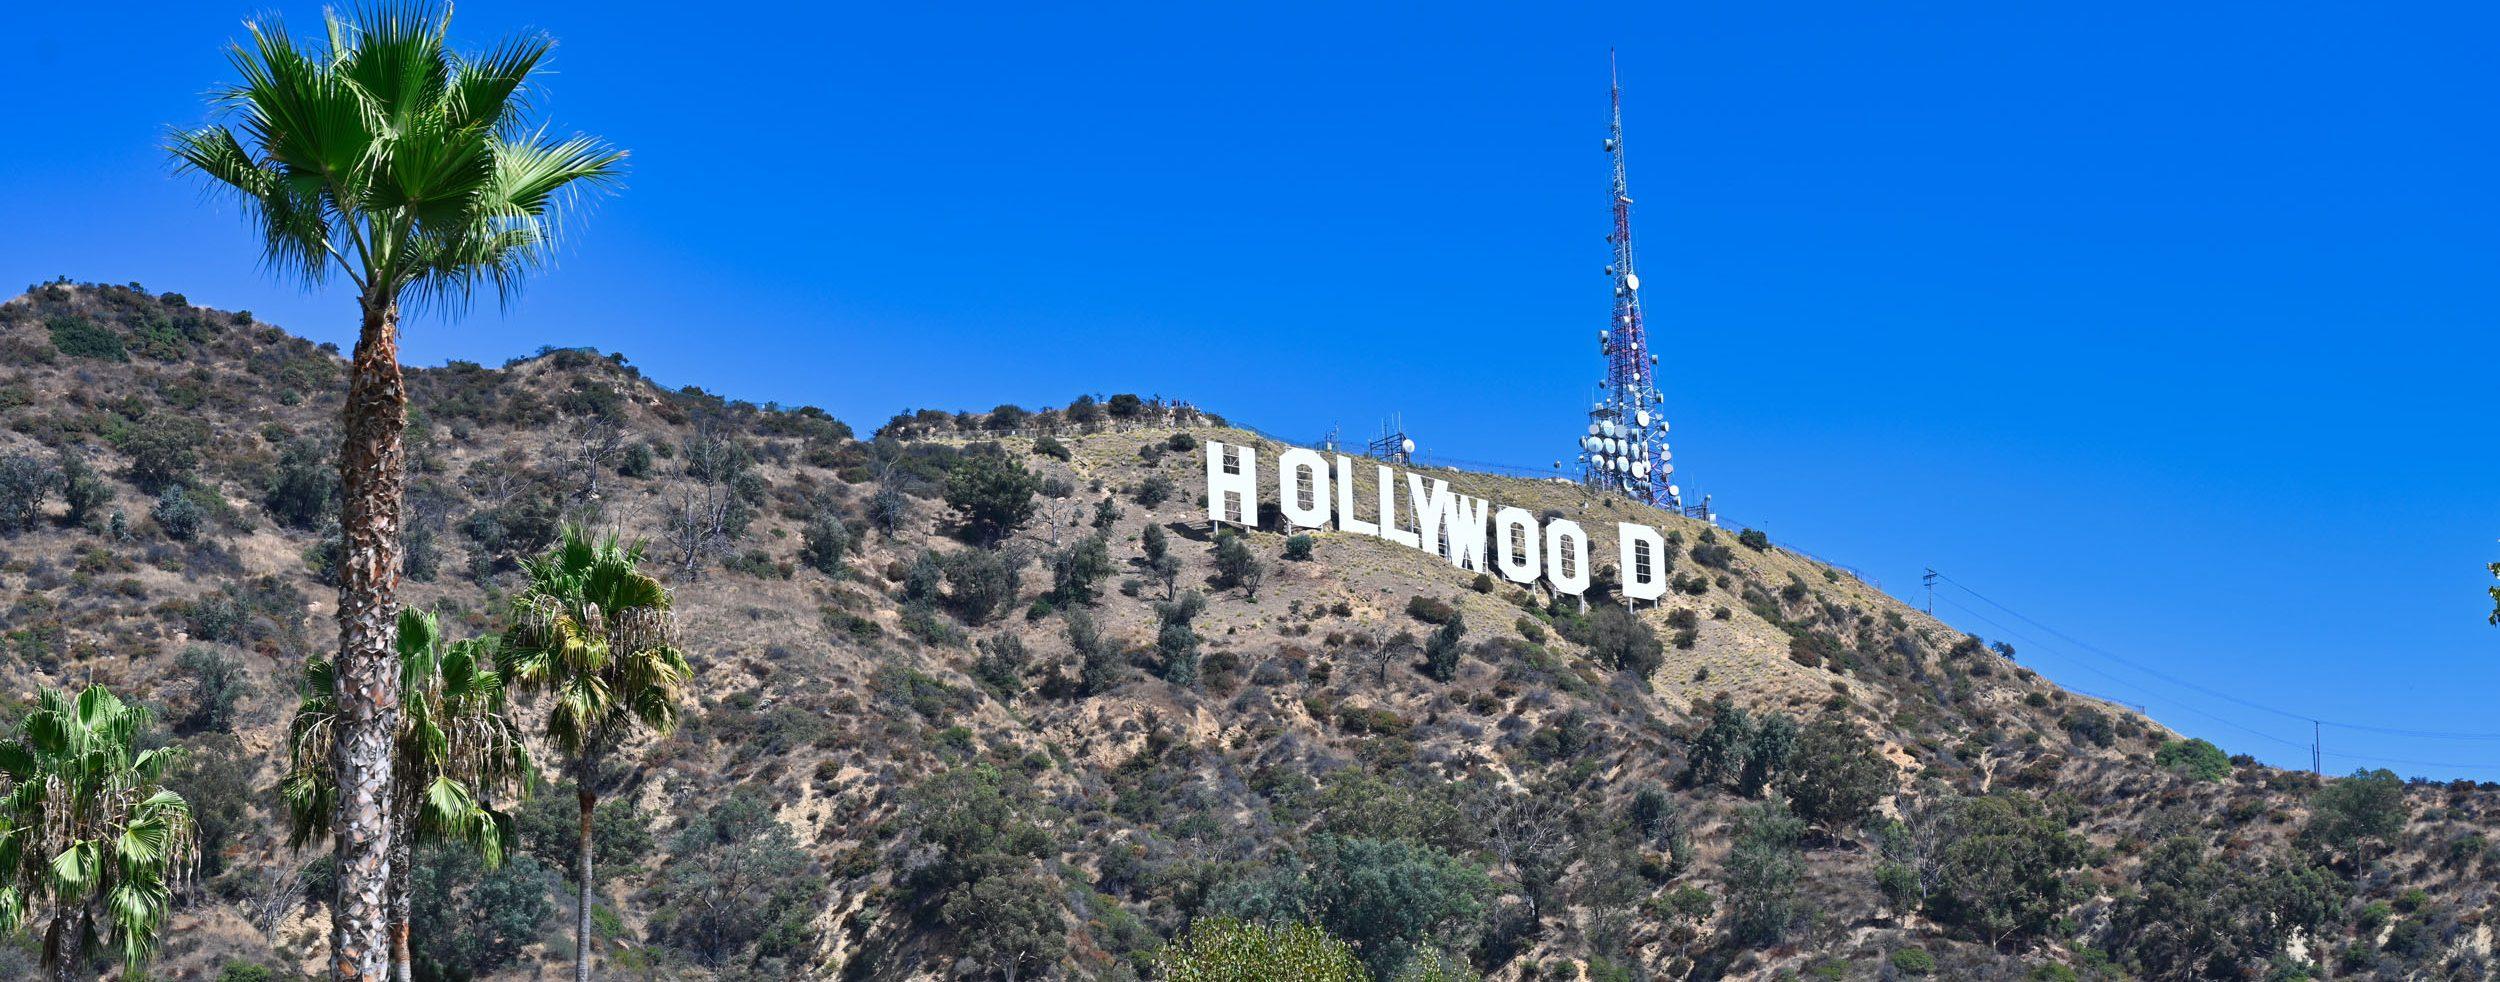 Hollywood-Schriftzug